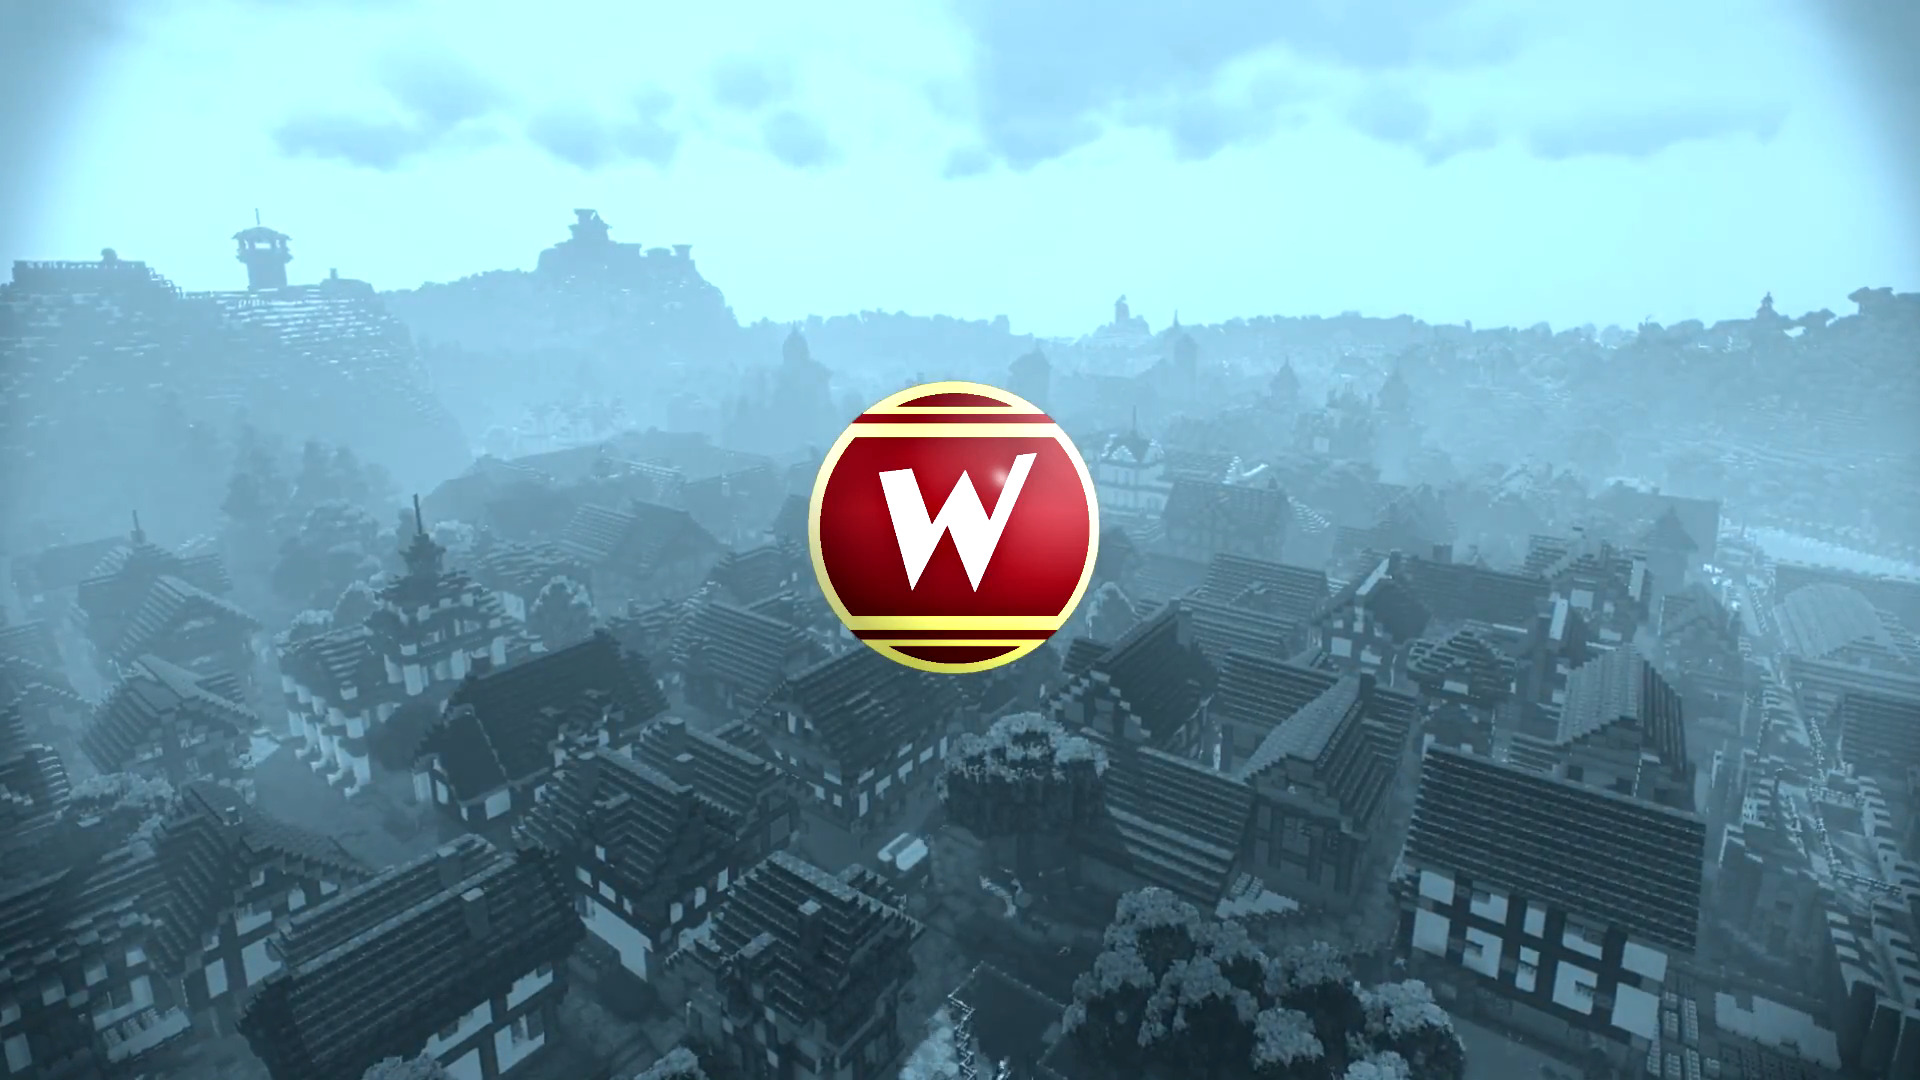 Winthor Winter Logo